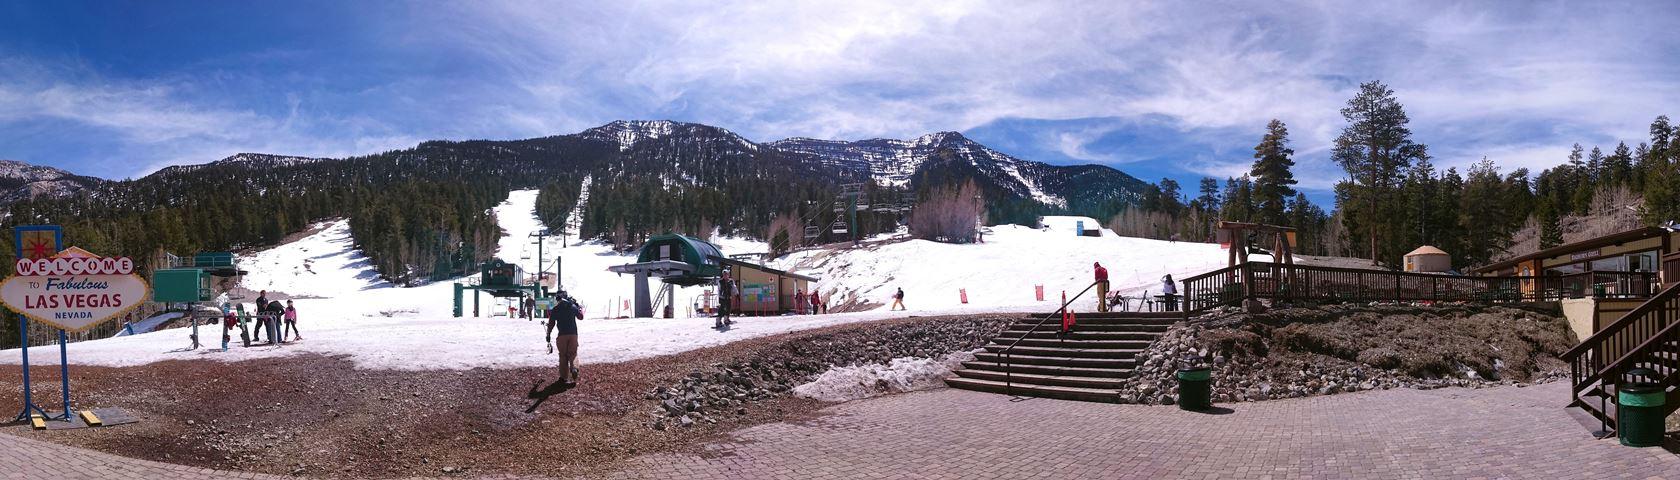 Las Vegas Ski Resort